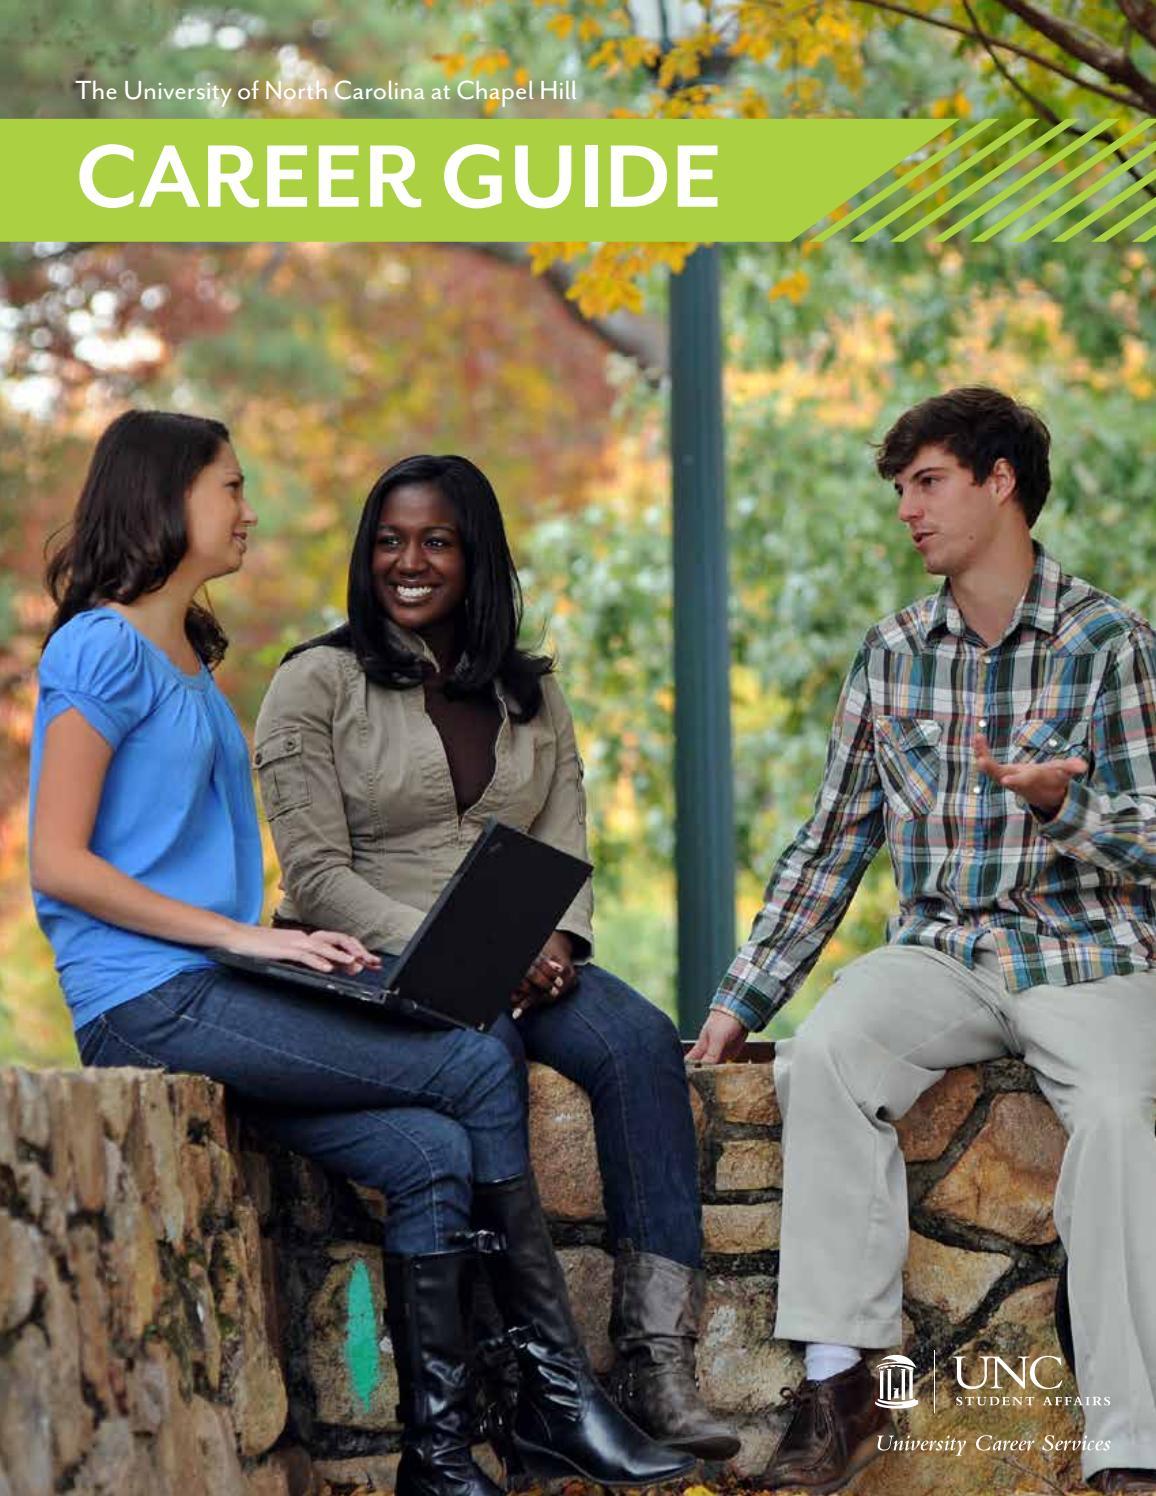 unc ucs career guide 2016 2017 by unc chapel hill university